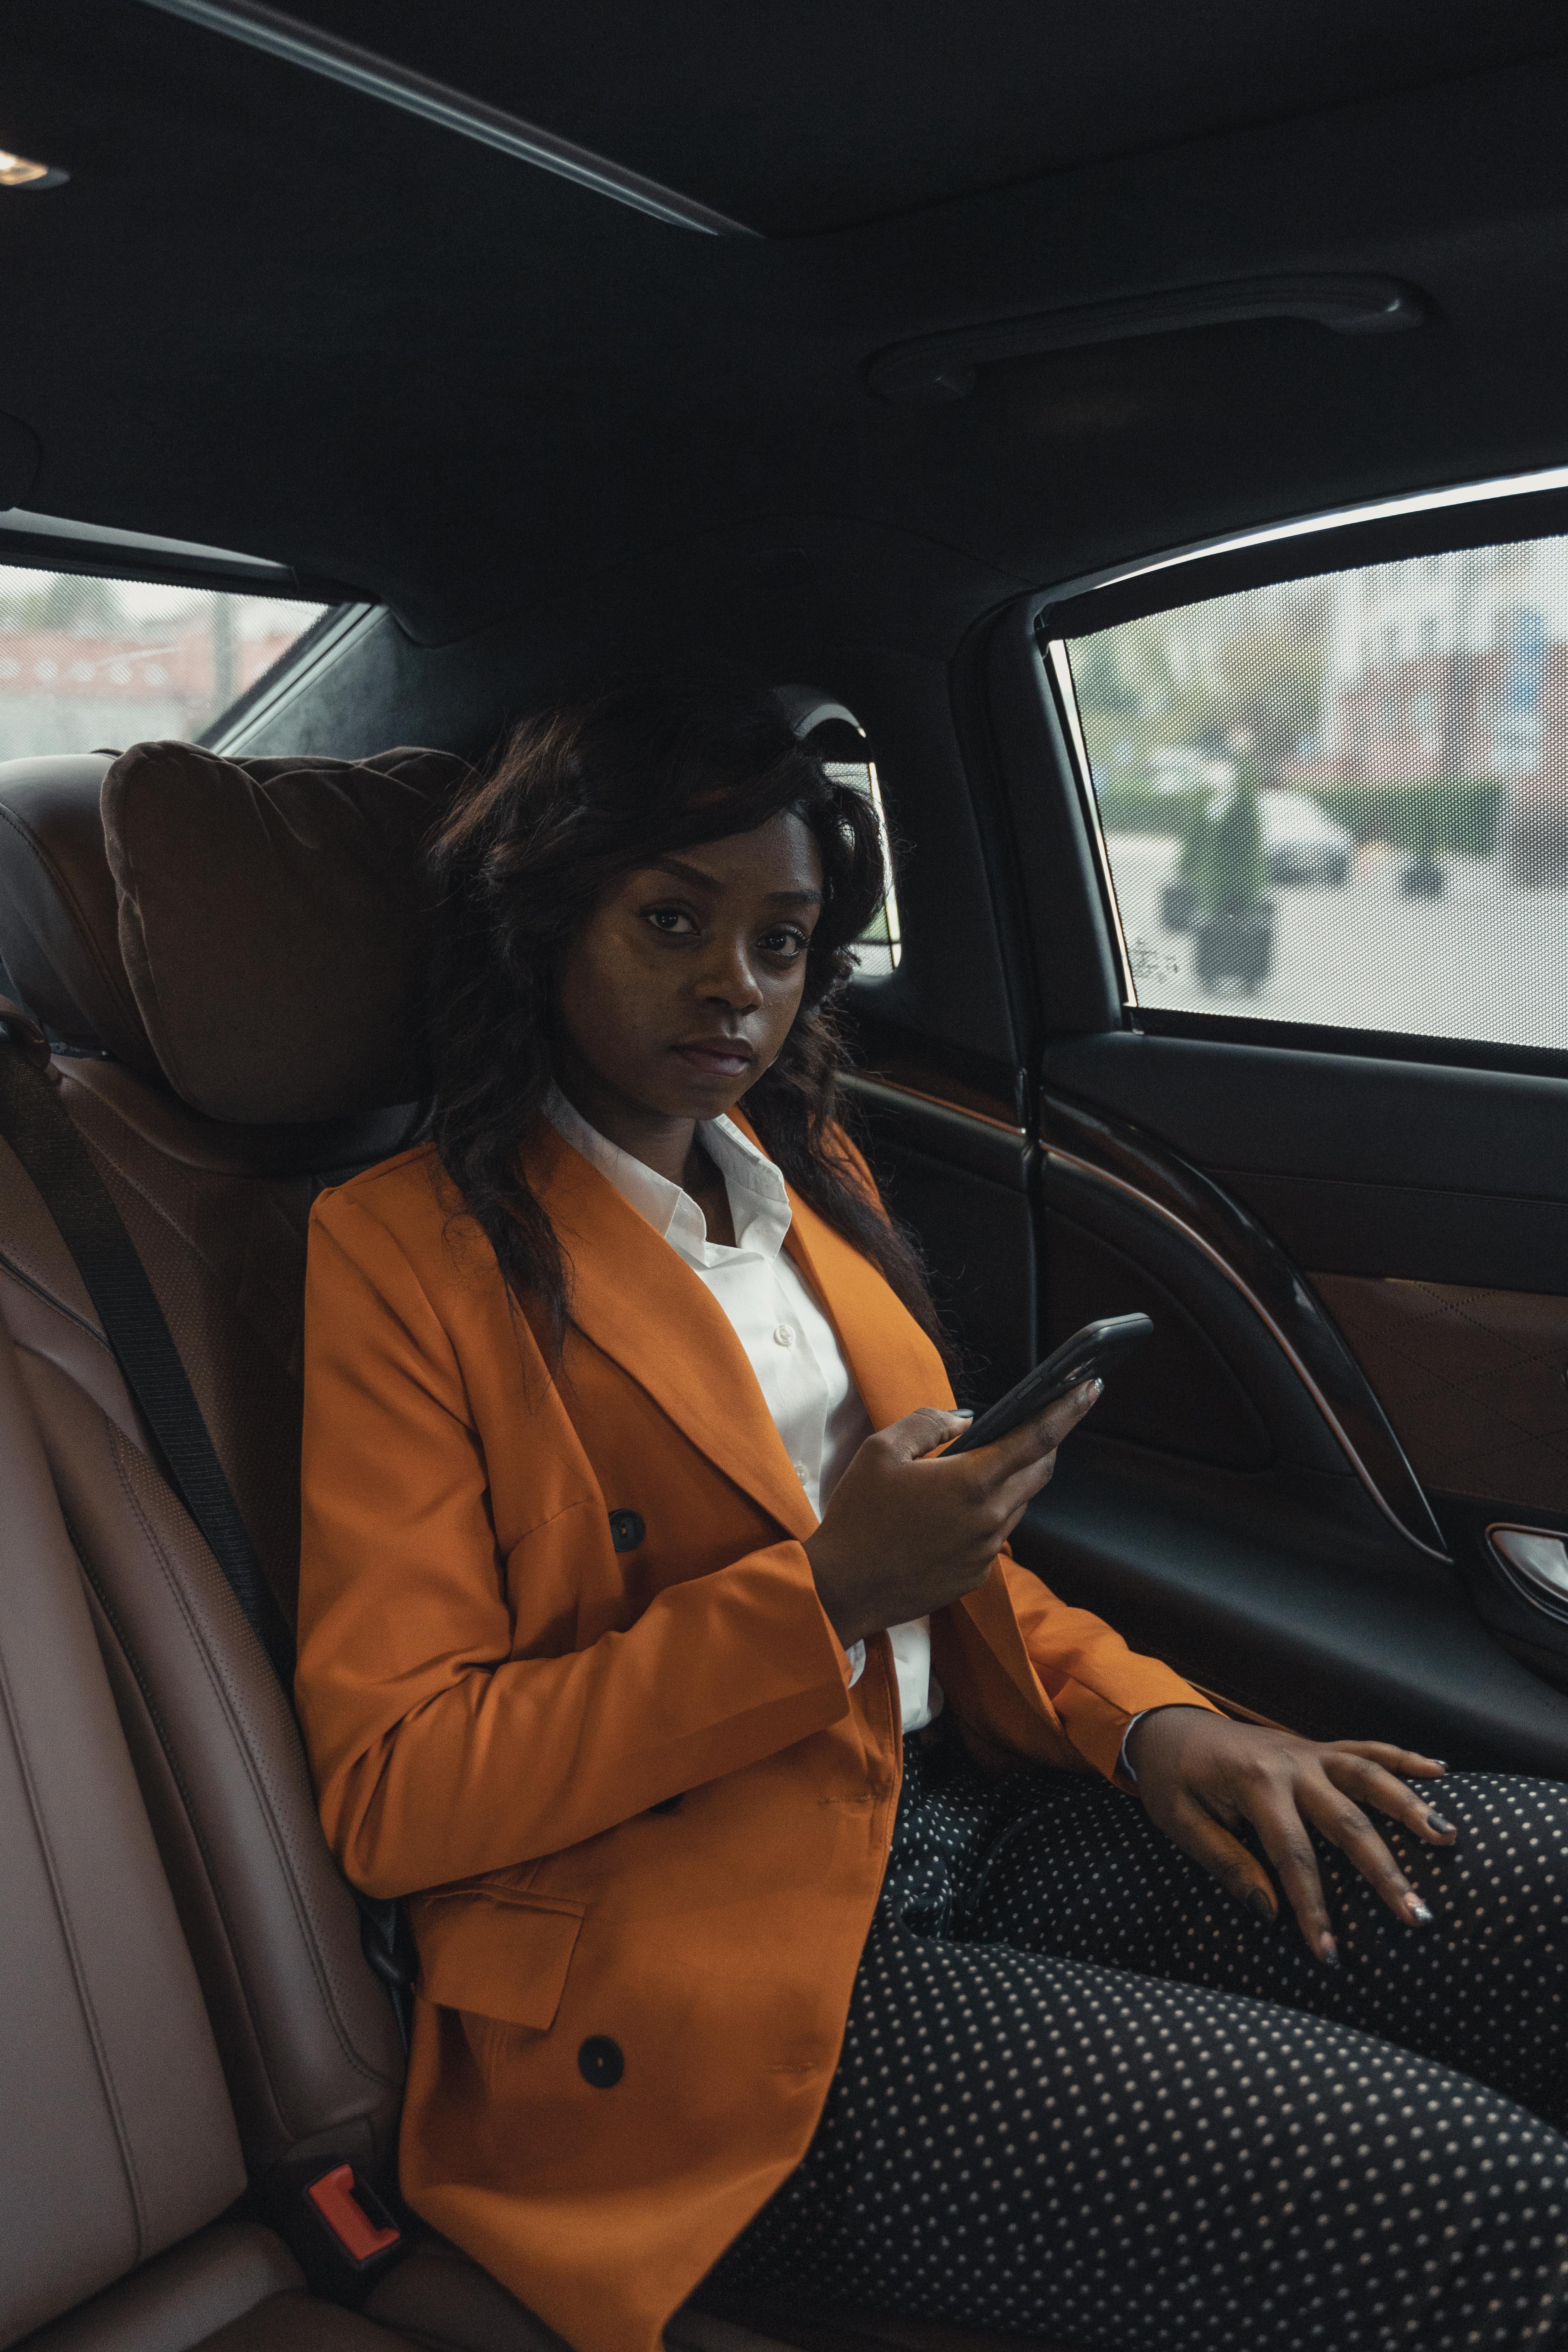 woman in orange blazer sitting on car holding her phone